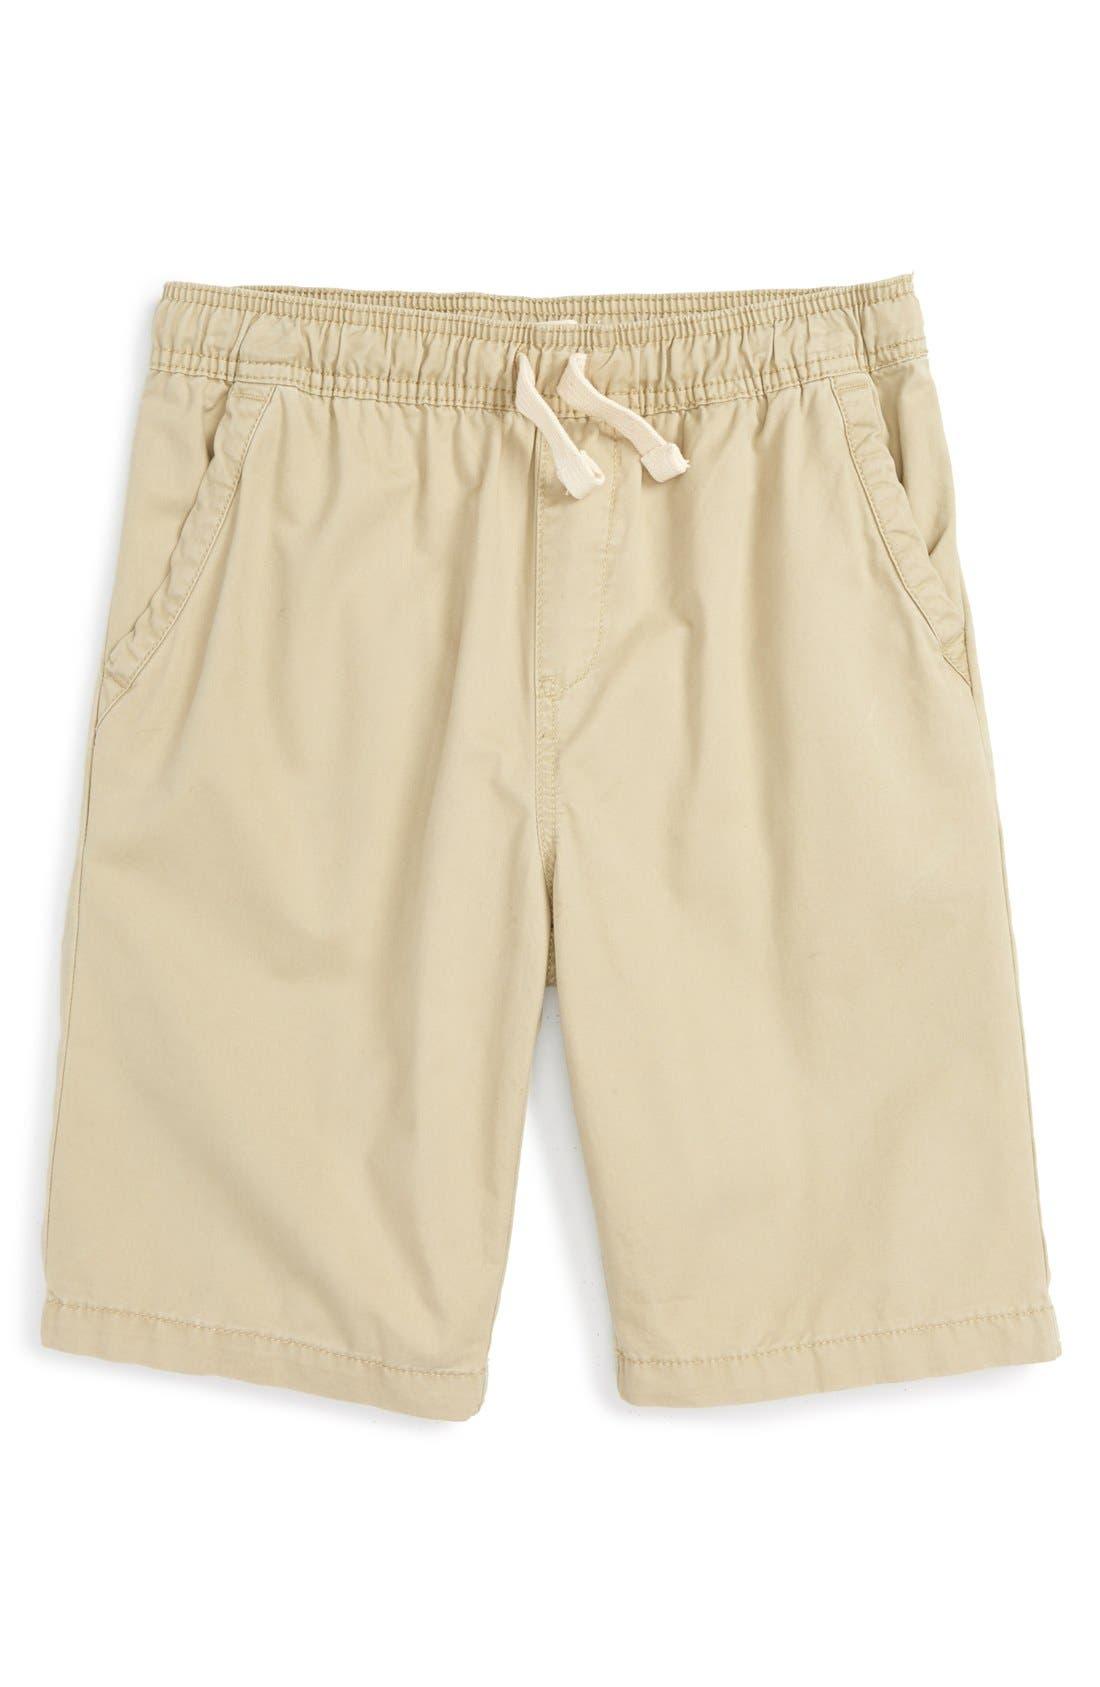 TUCKER + TATE Cotton Twill Shorts